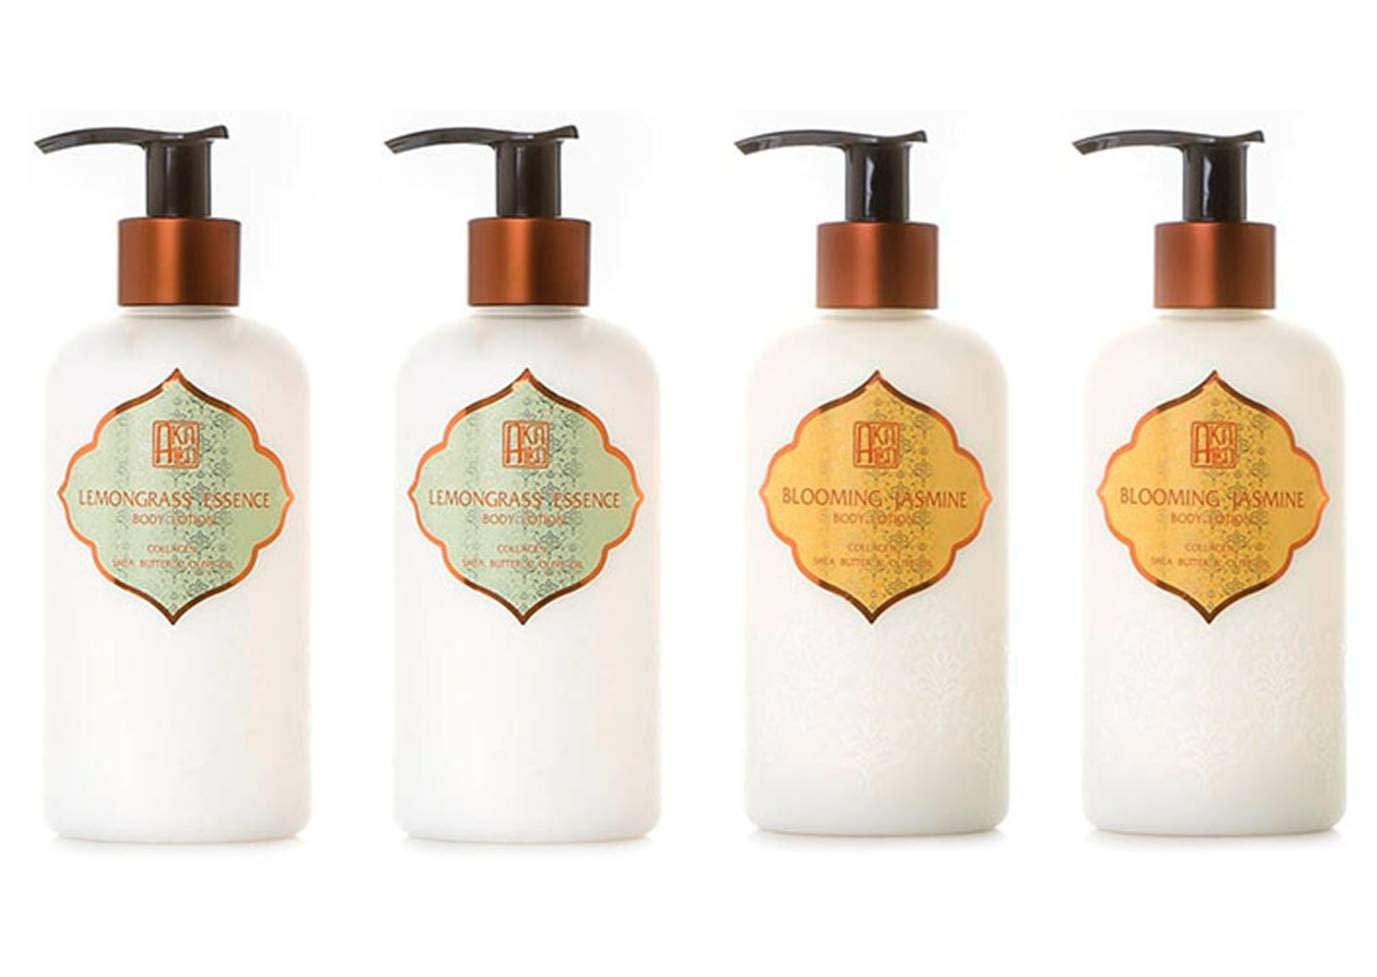 AKALIKO Lemongrass Essence and Blooming Jasmine Body Lotion Set - wit